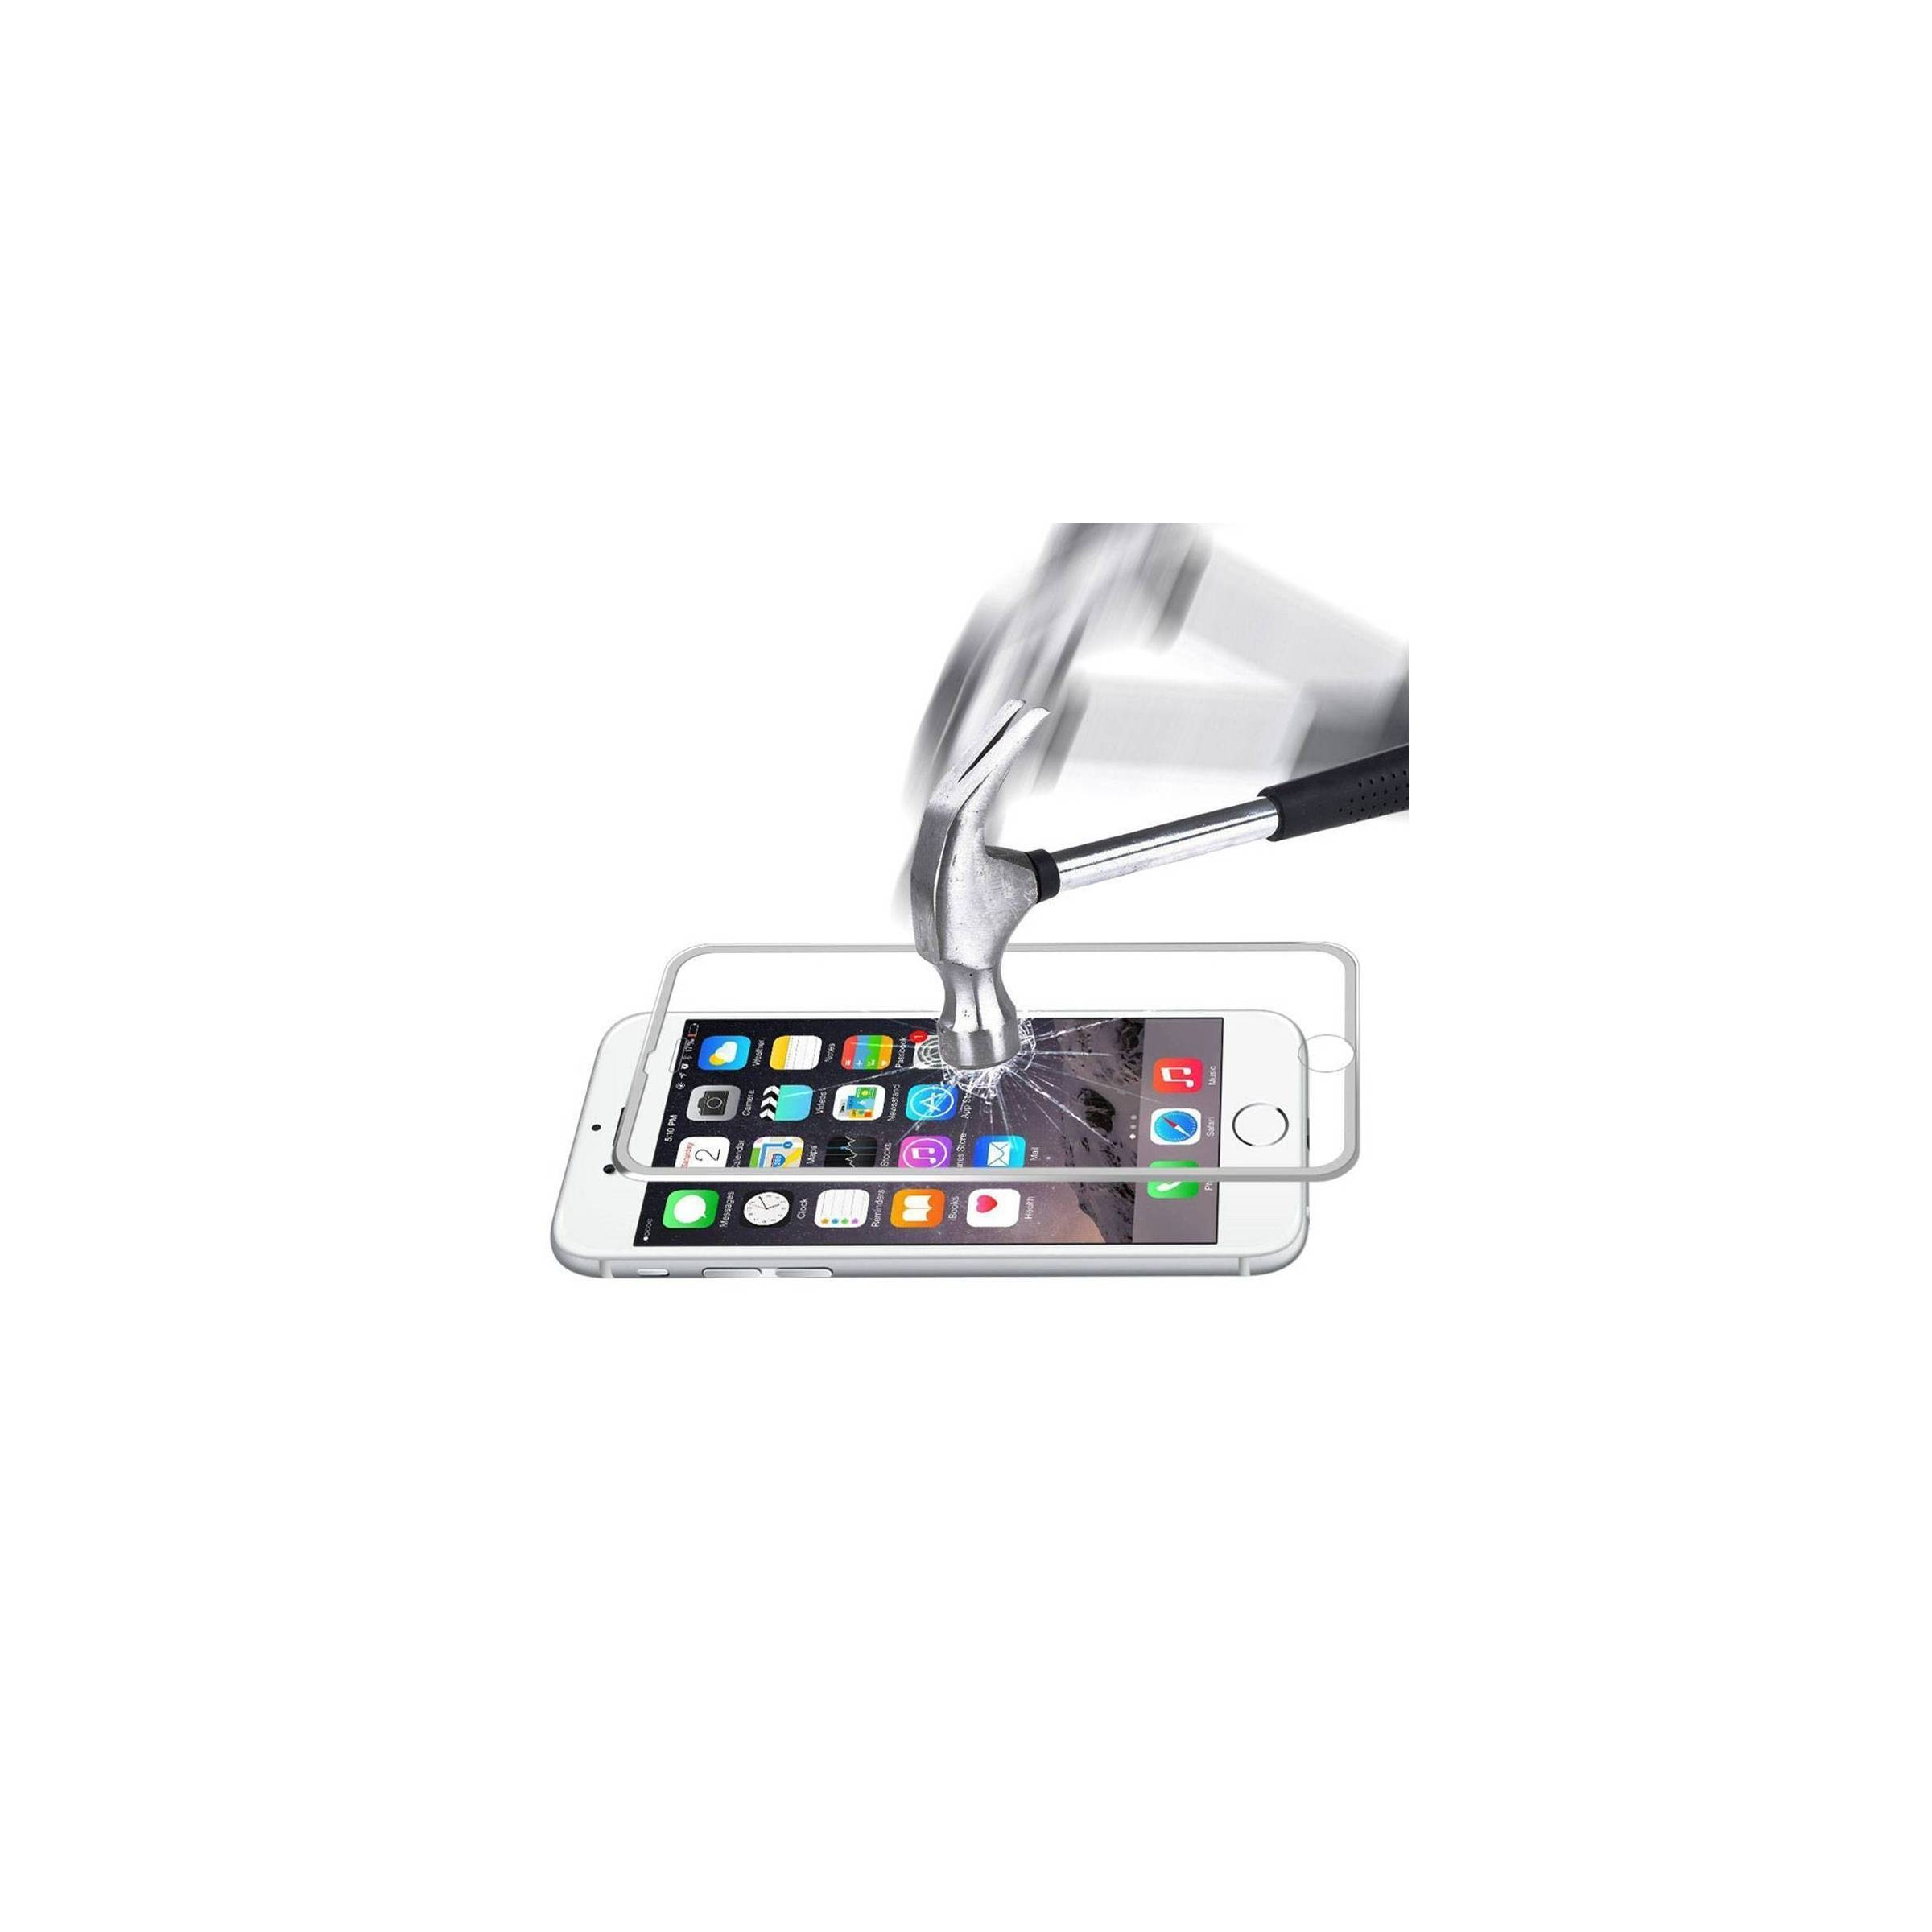 enkay – Iphone beskyttelsesglas 3d farve sølv farve, iphone iphone 6 plus/ 6s plus / 7 plus / 8 plus fra mackabler.dk